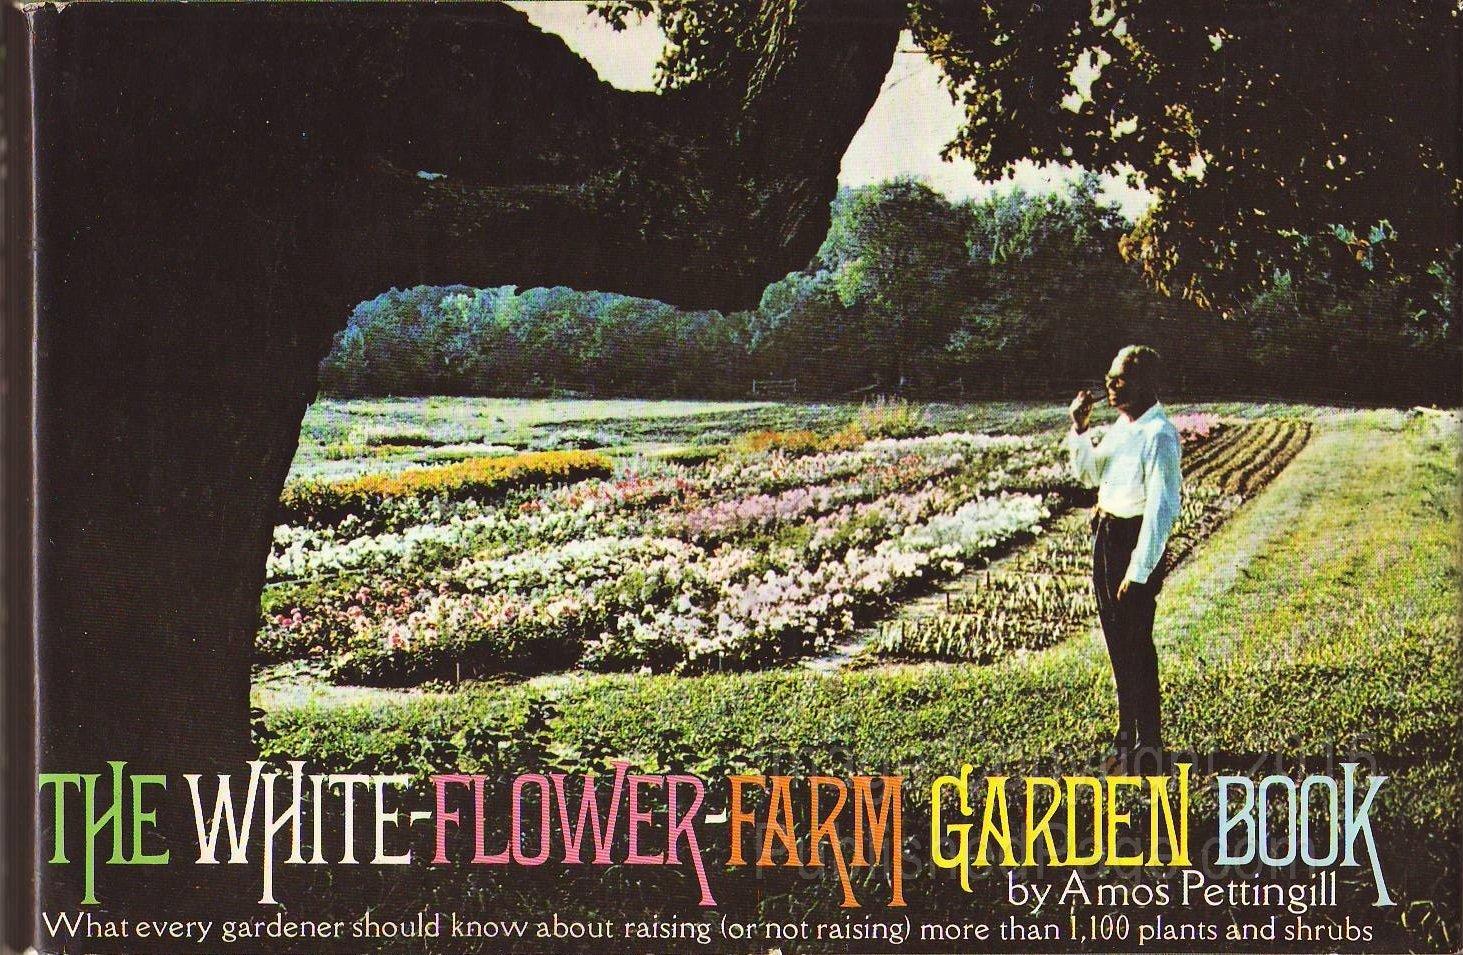 The White Flower Farm Garden Book Amos Pettingill 9780394468723